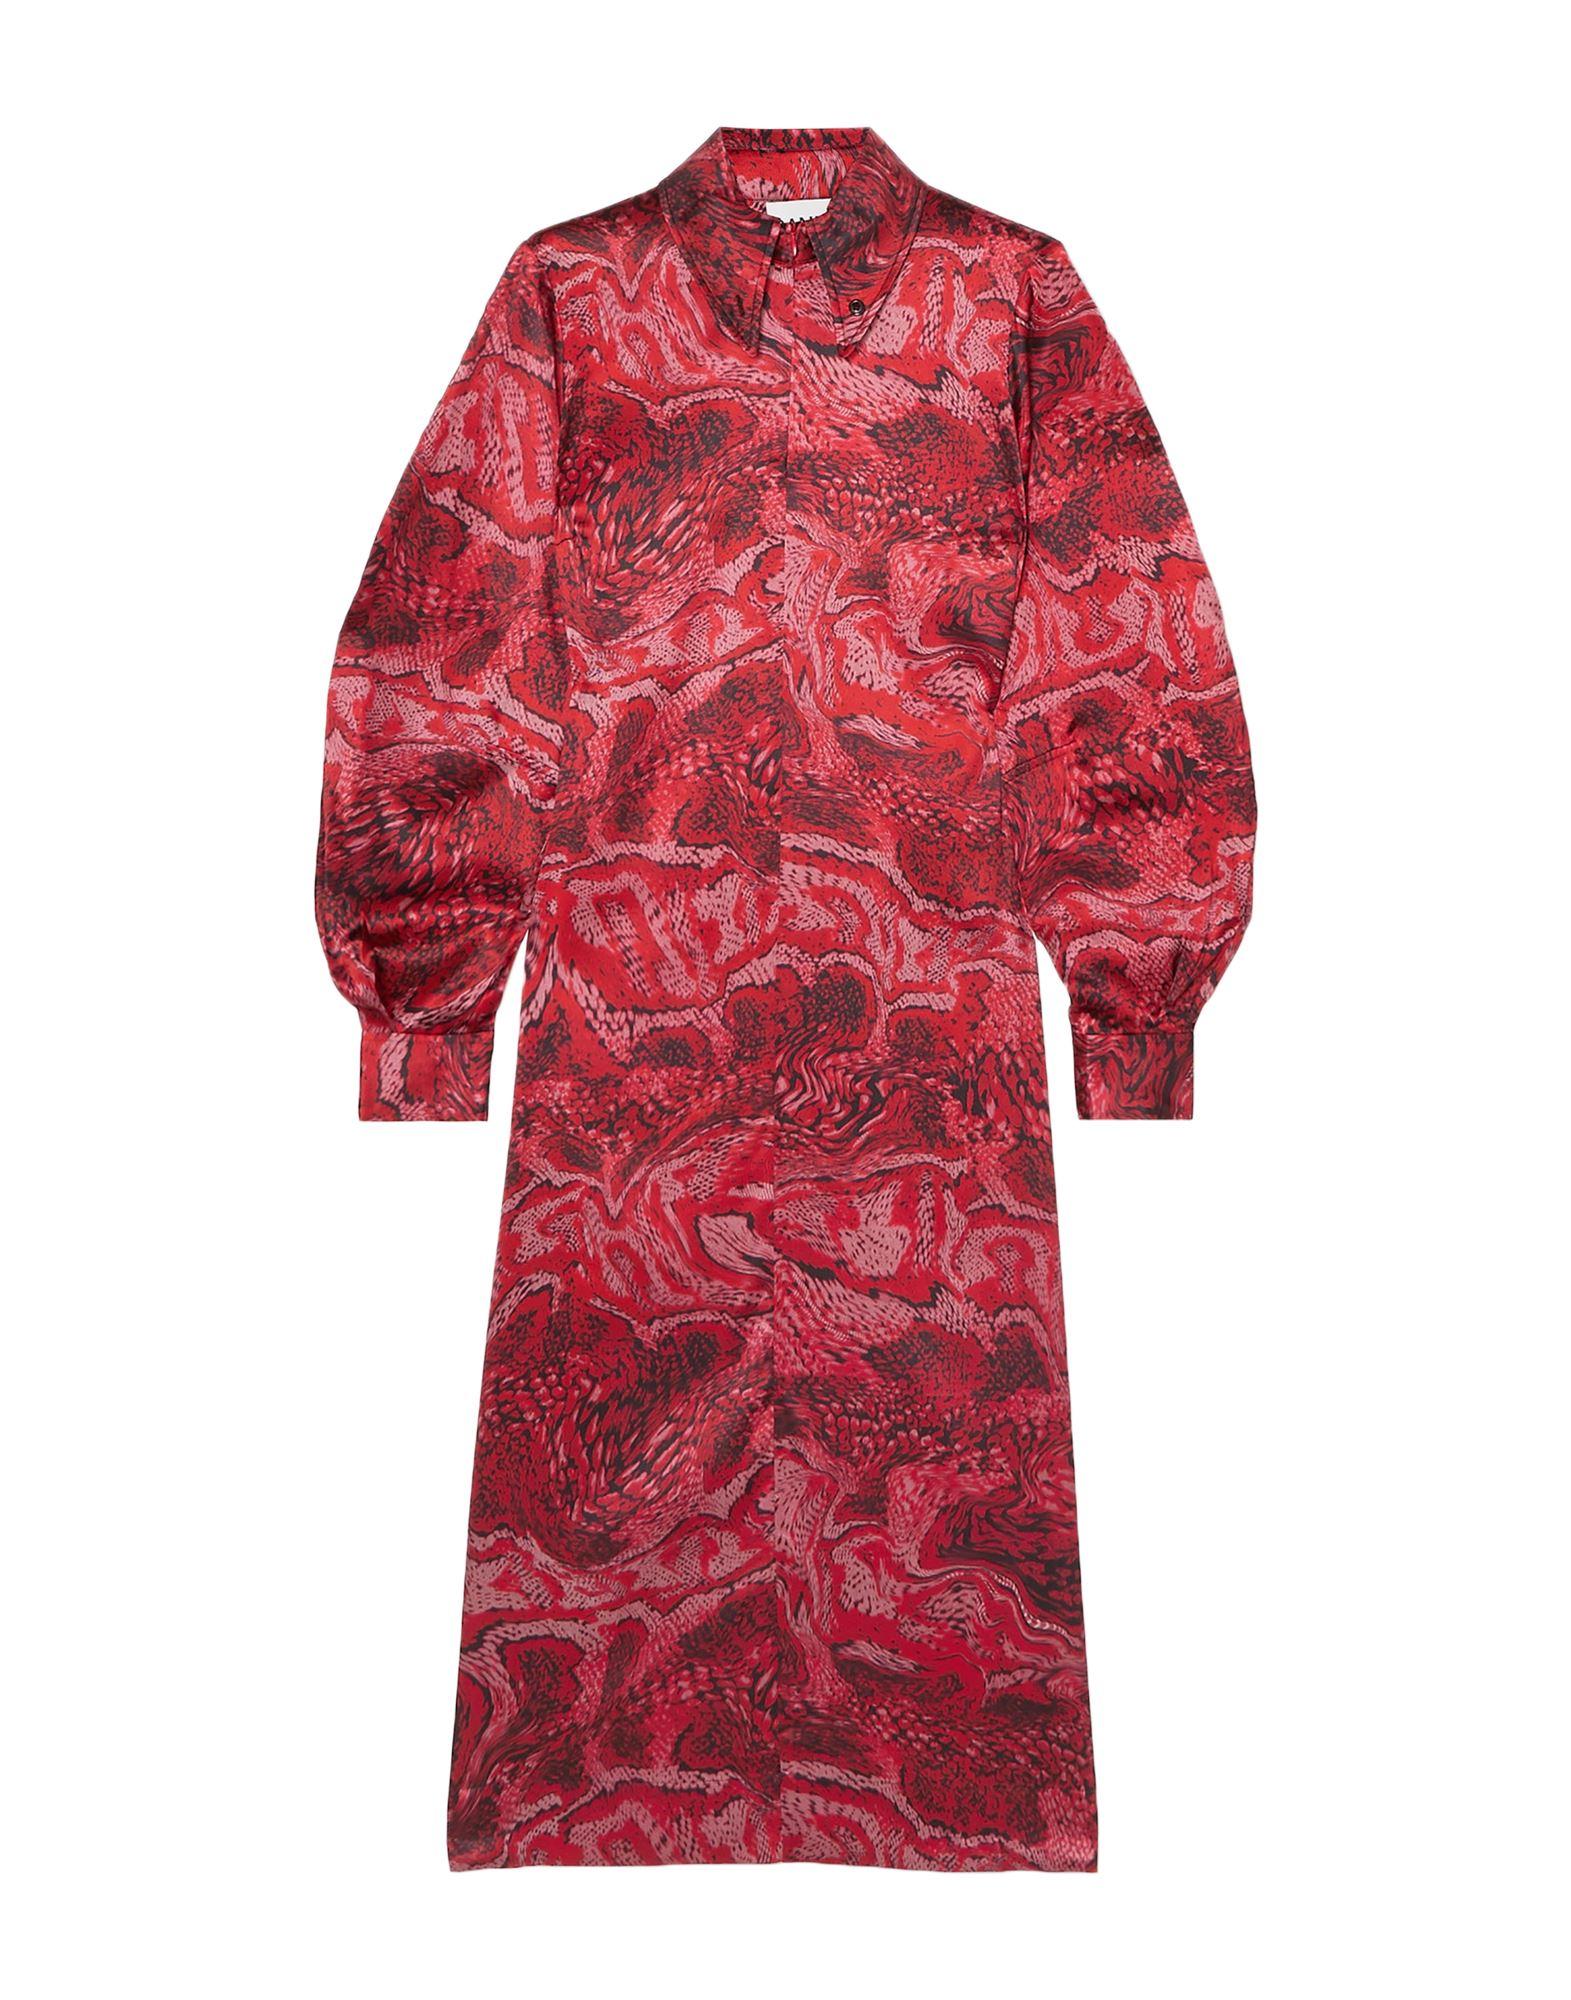 GANNI 3/4 length dresses. satin, no appliqués, multicolor pattern, classic neckline, long sleeves, no pockets, front closure, zipper closure, unlined, stretch. 92% Silk, 8% Elastane